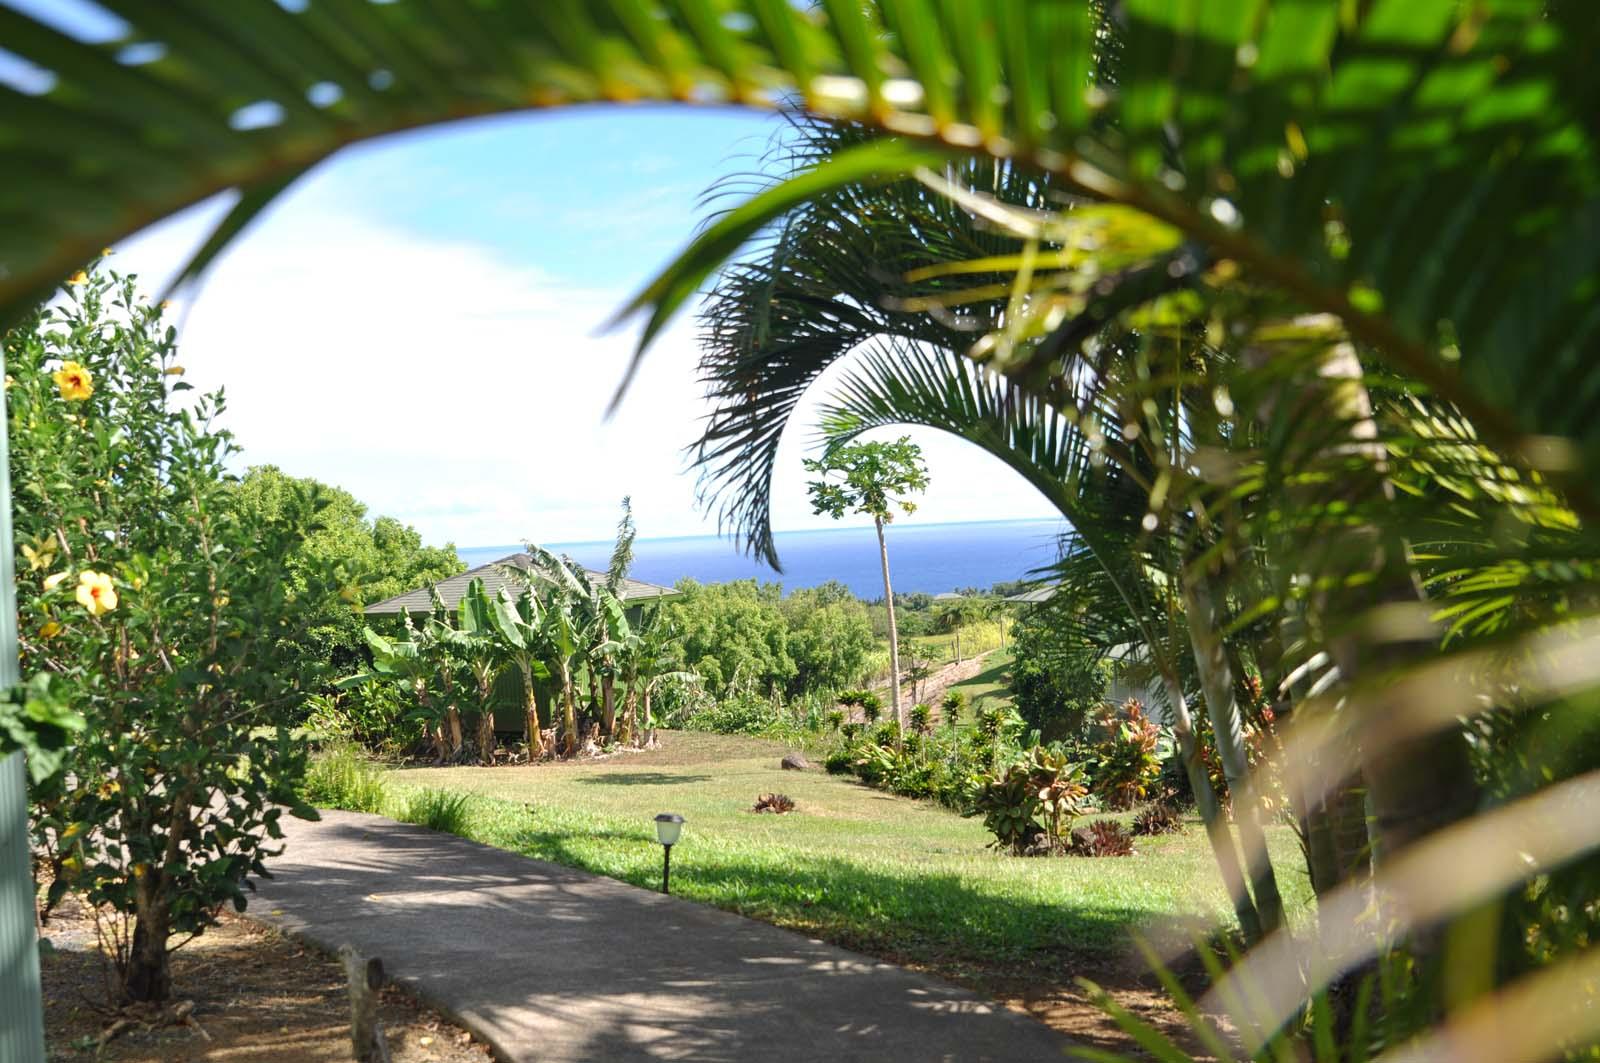 025_maui_hawaii_island